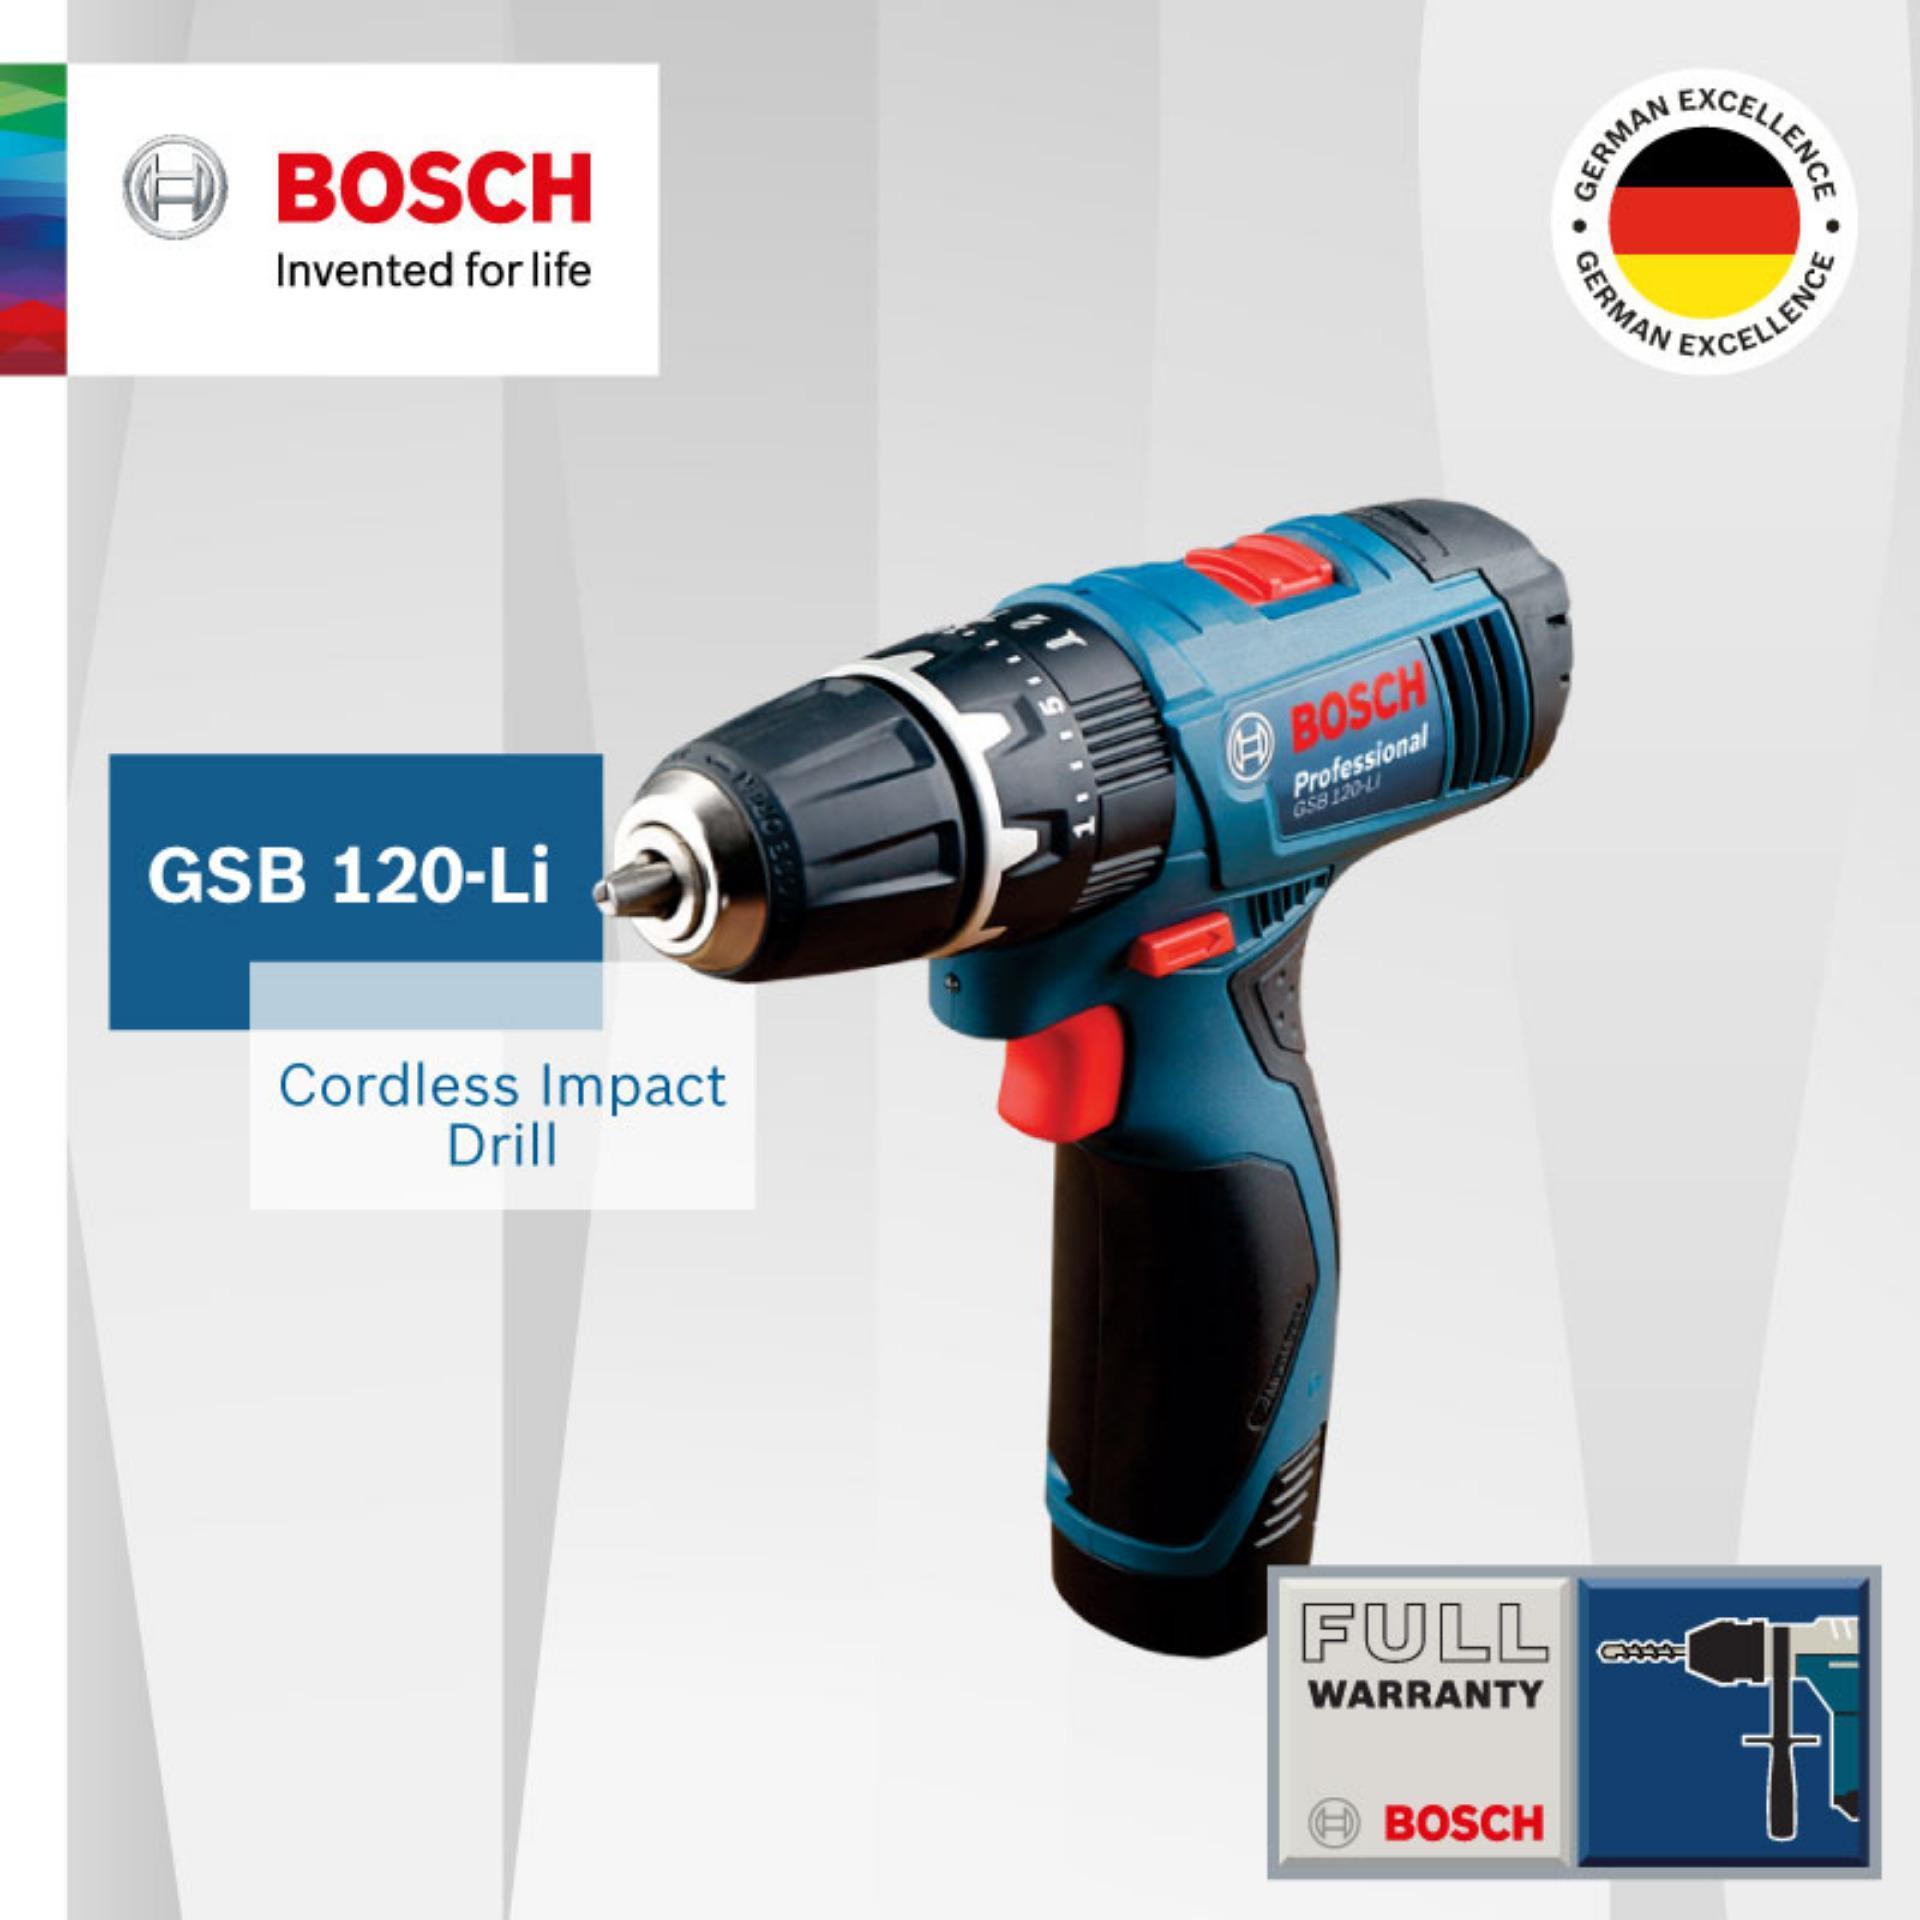 Bosch GSB 120-Li Cordless Impact Drill Set